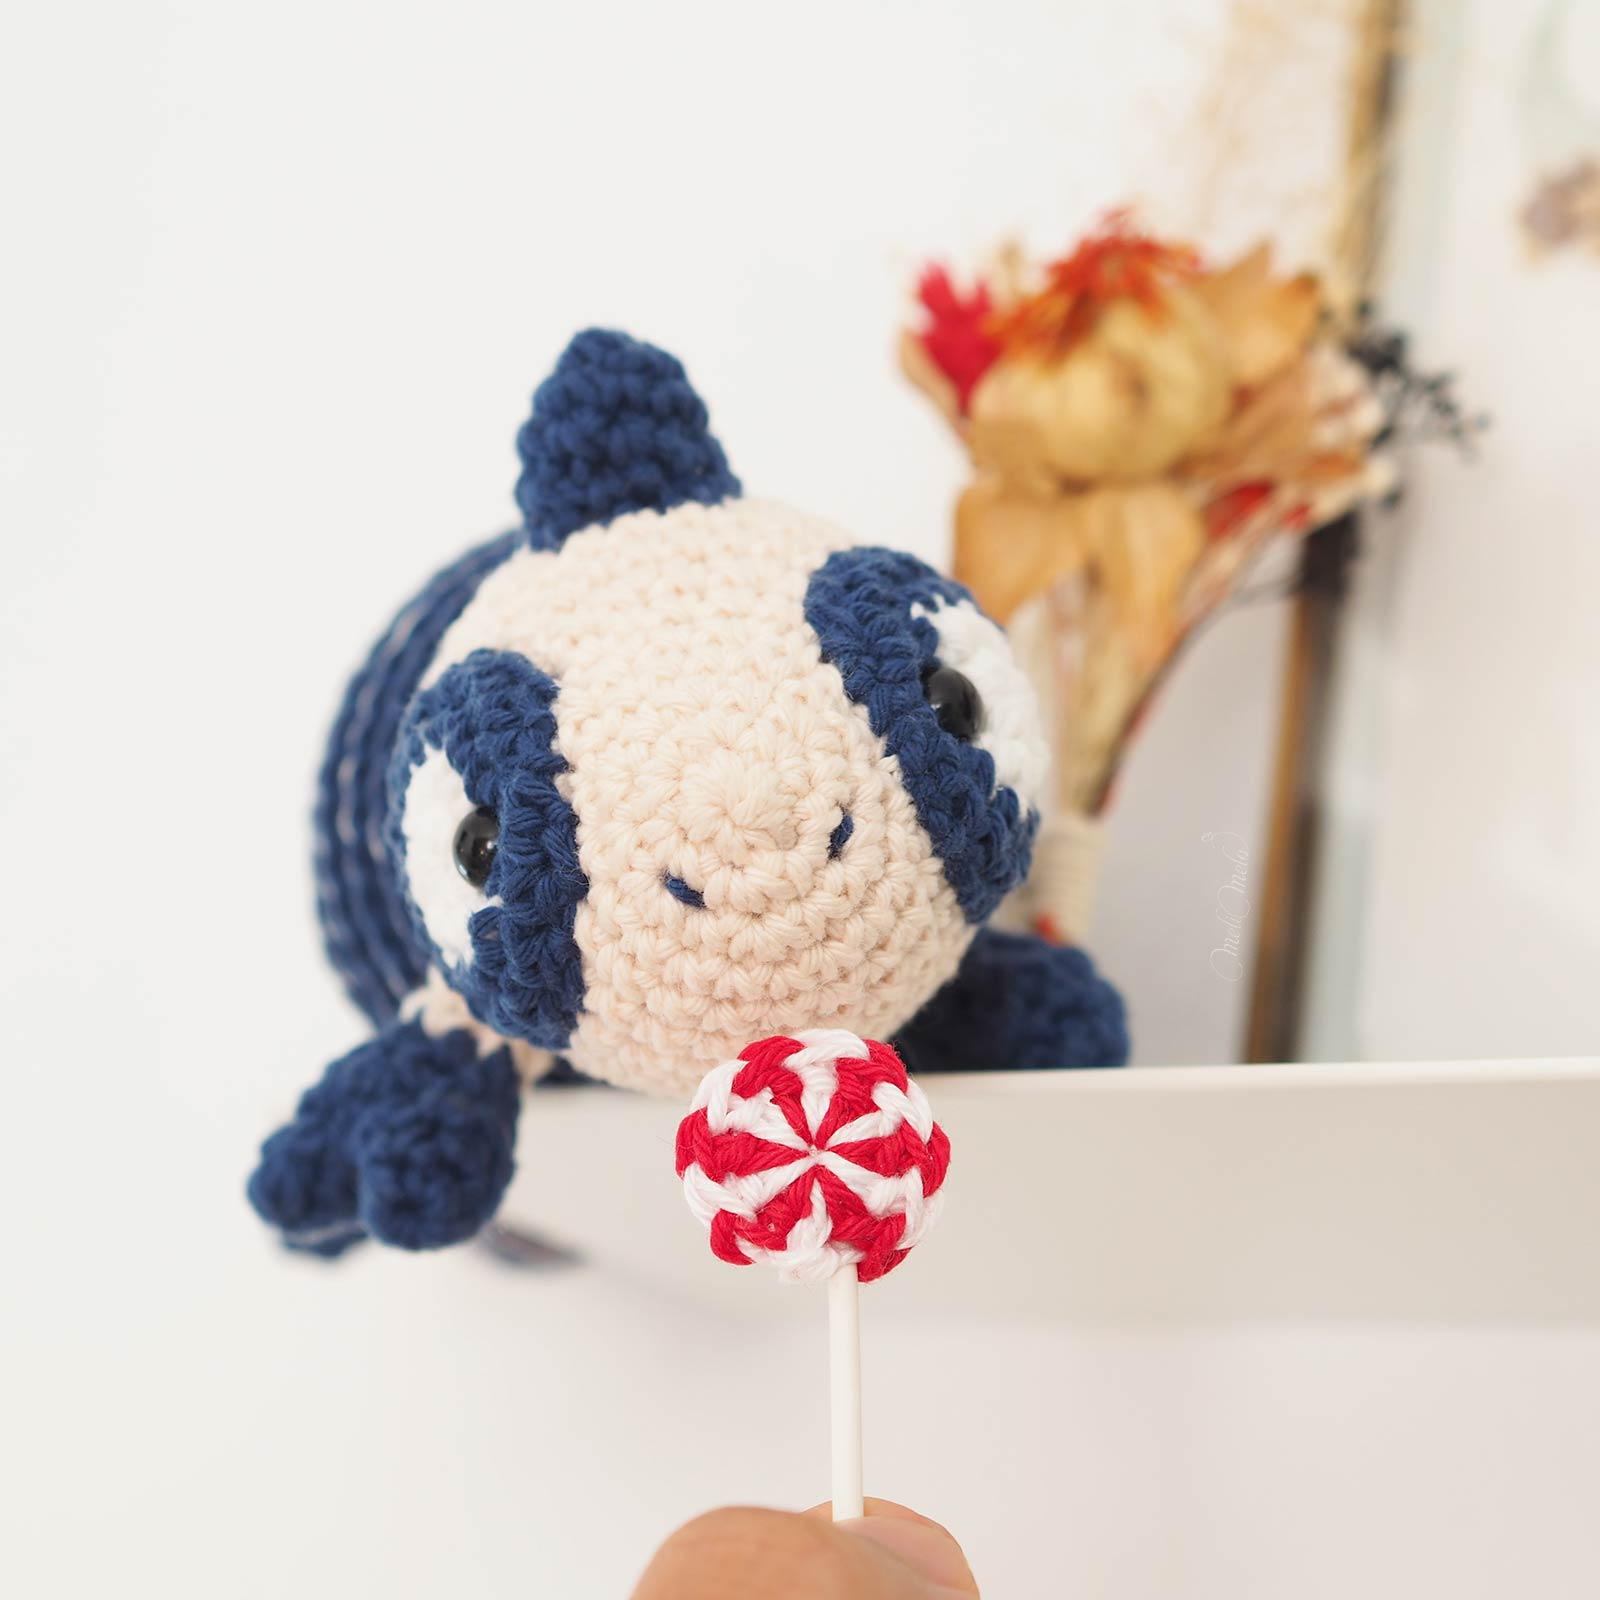 crochet peppermint candy petalstopicots chameleon amigurumi laboutiquedemelimelo